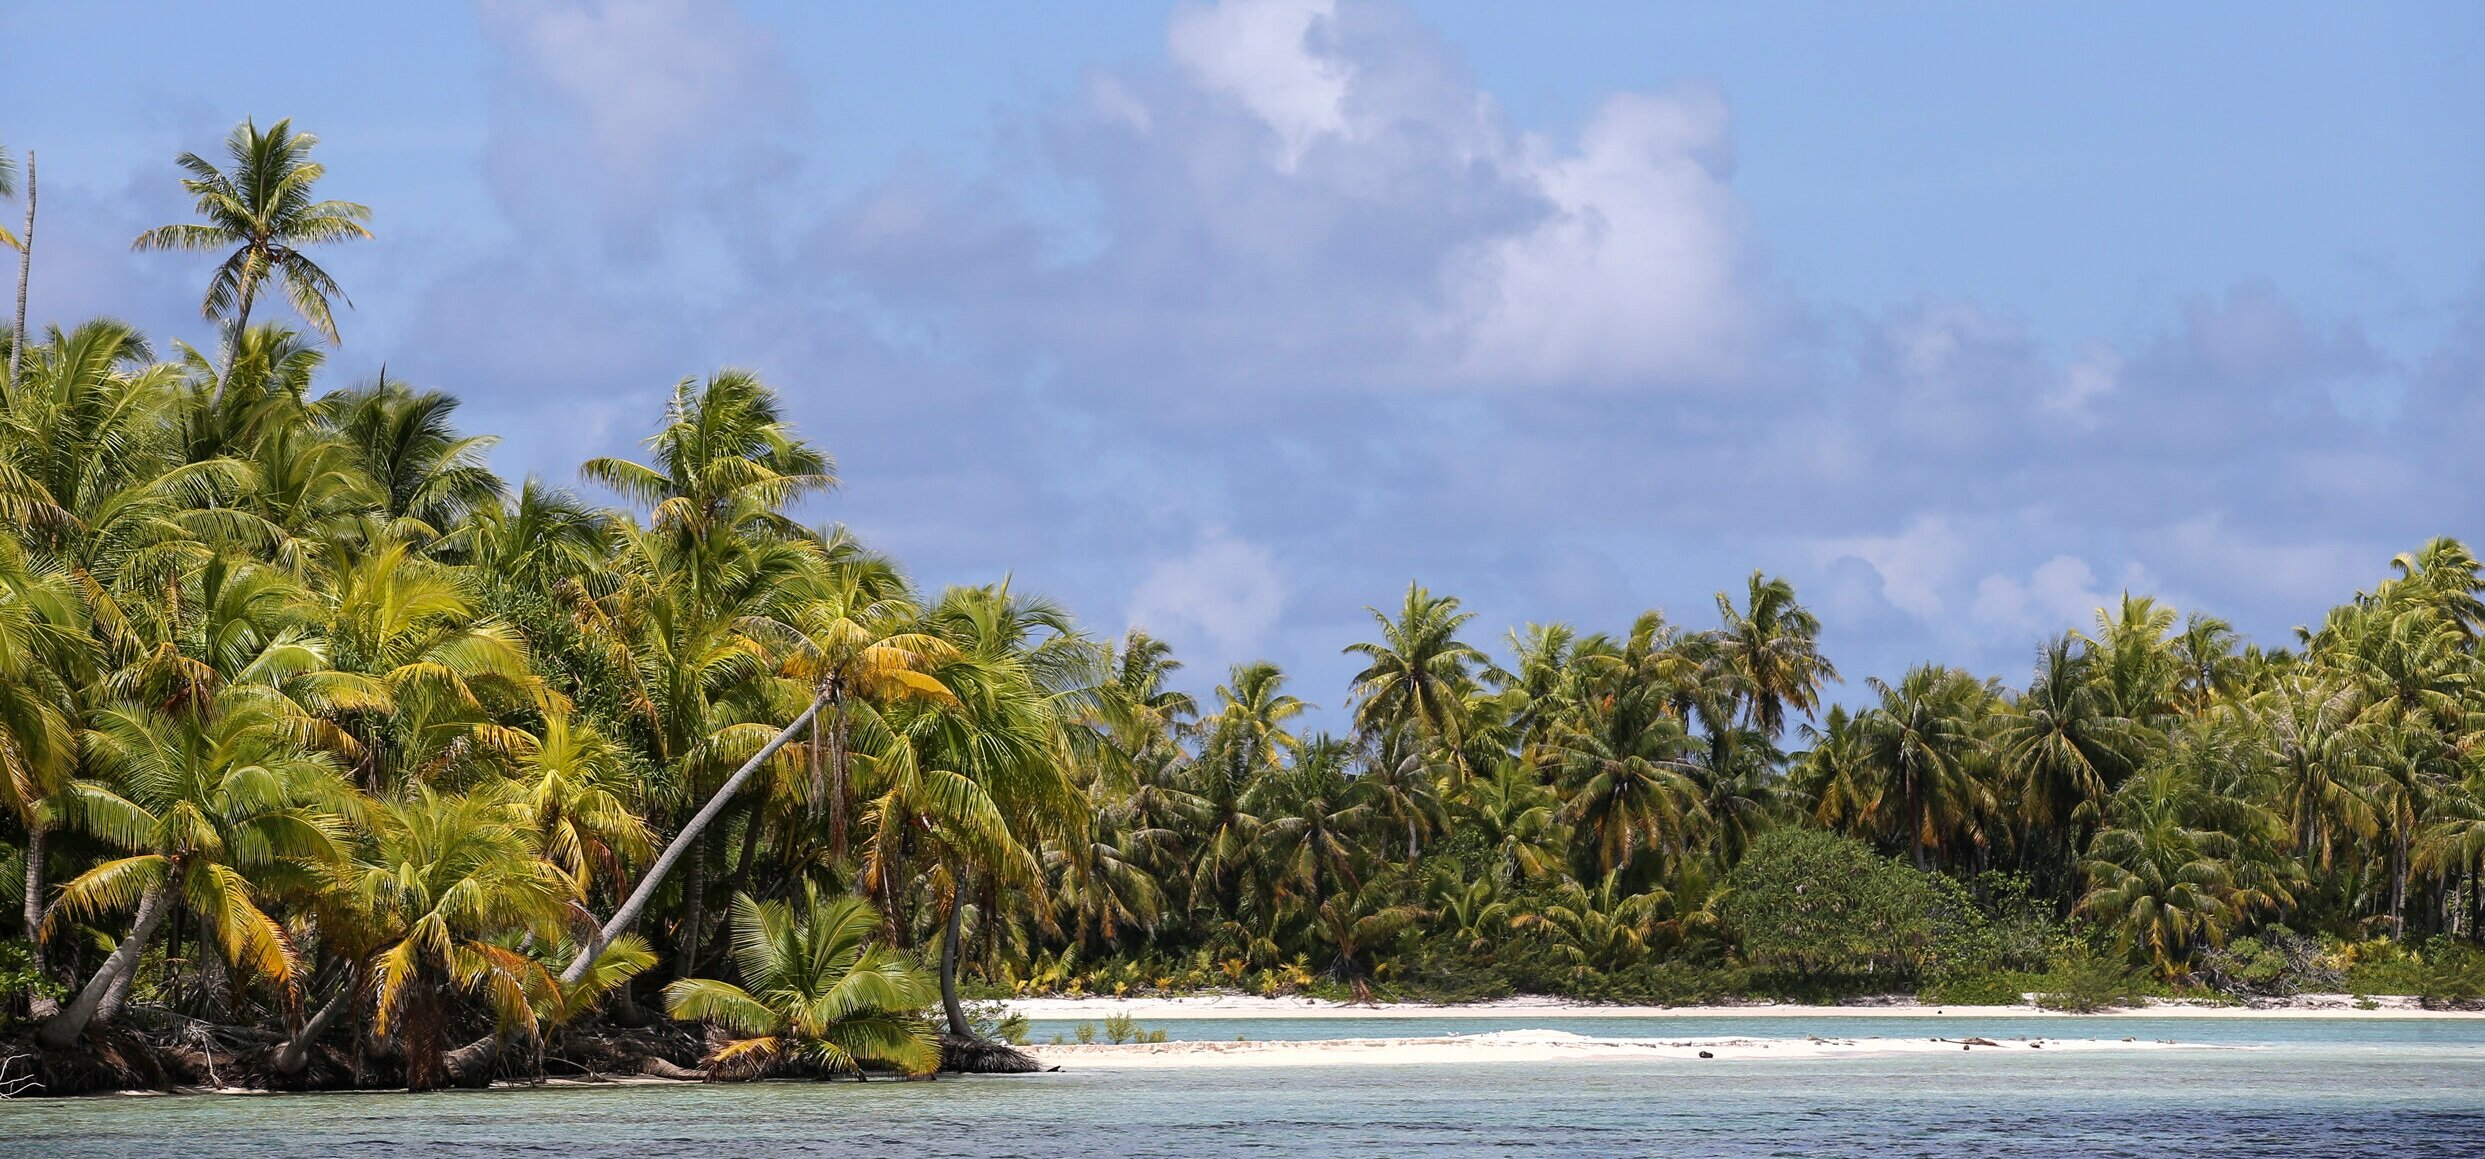 P2_08_RANGIROA_tahiti_tourisme_rangiroa+%2832%29_%C2%A9+Vincent+LYKY.jpg